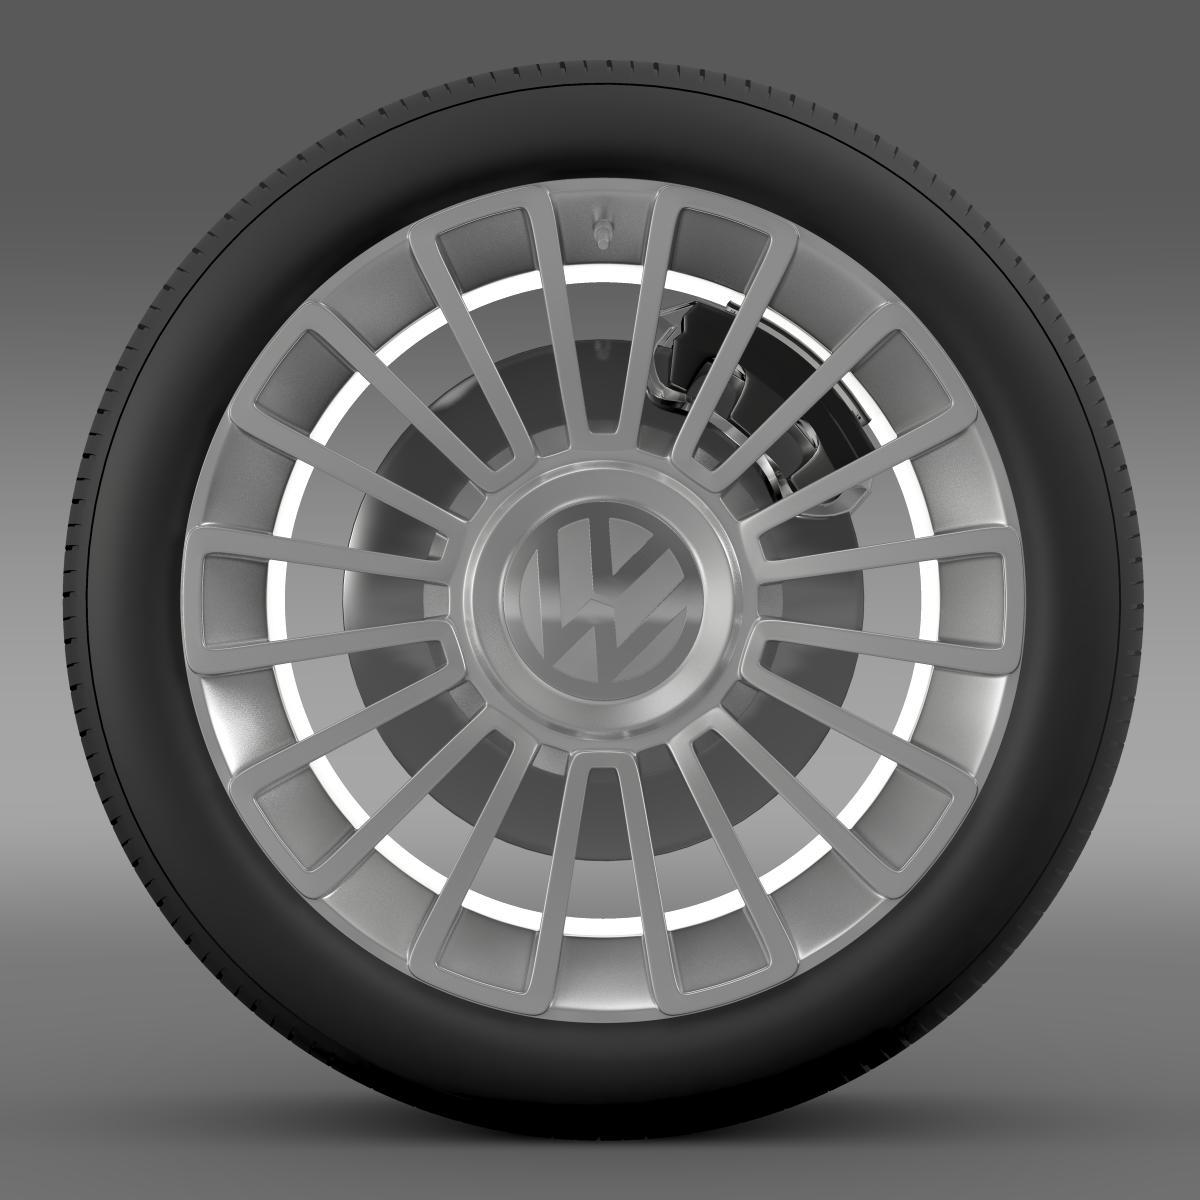 volkswagen up wheel 3d model 3ds max fbx c4d lwo ma mb hrc xsi obj 210884